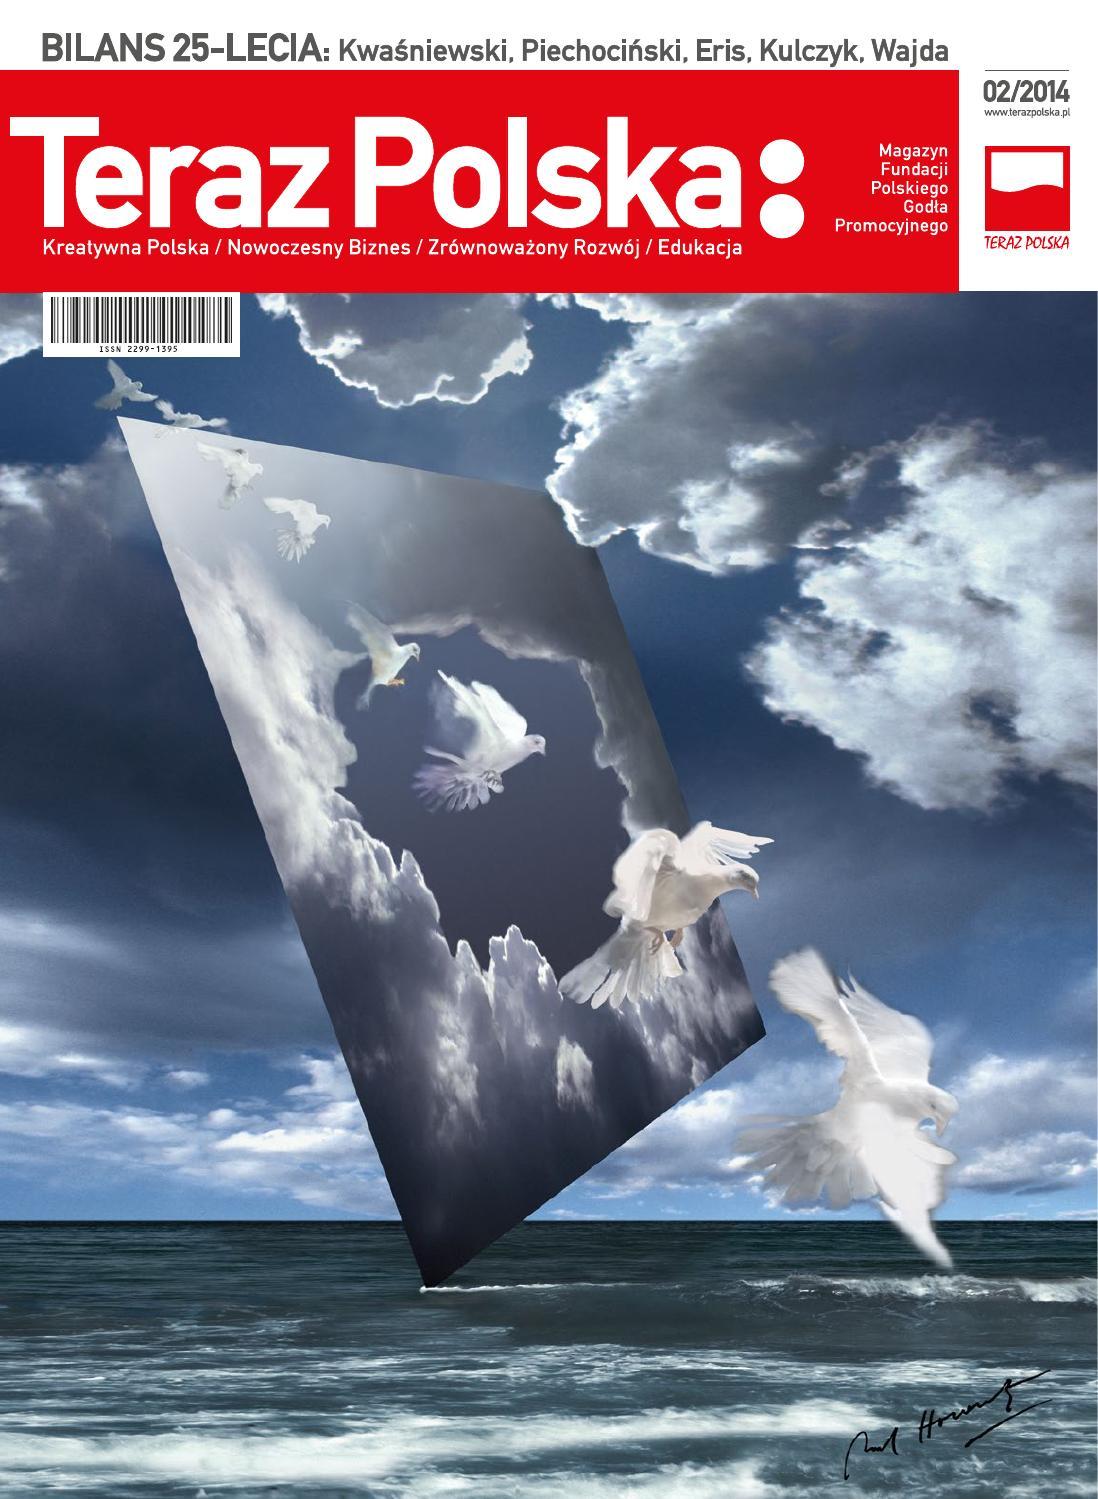 e6f721c2977c25 MAGAZYN TERAZ POLSKA 02/2014 by Best Place Institute - issuu